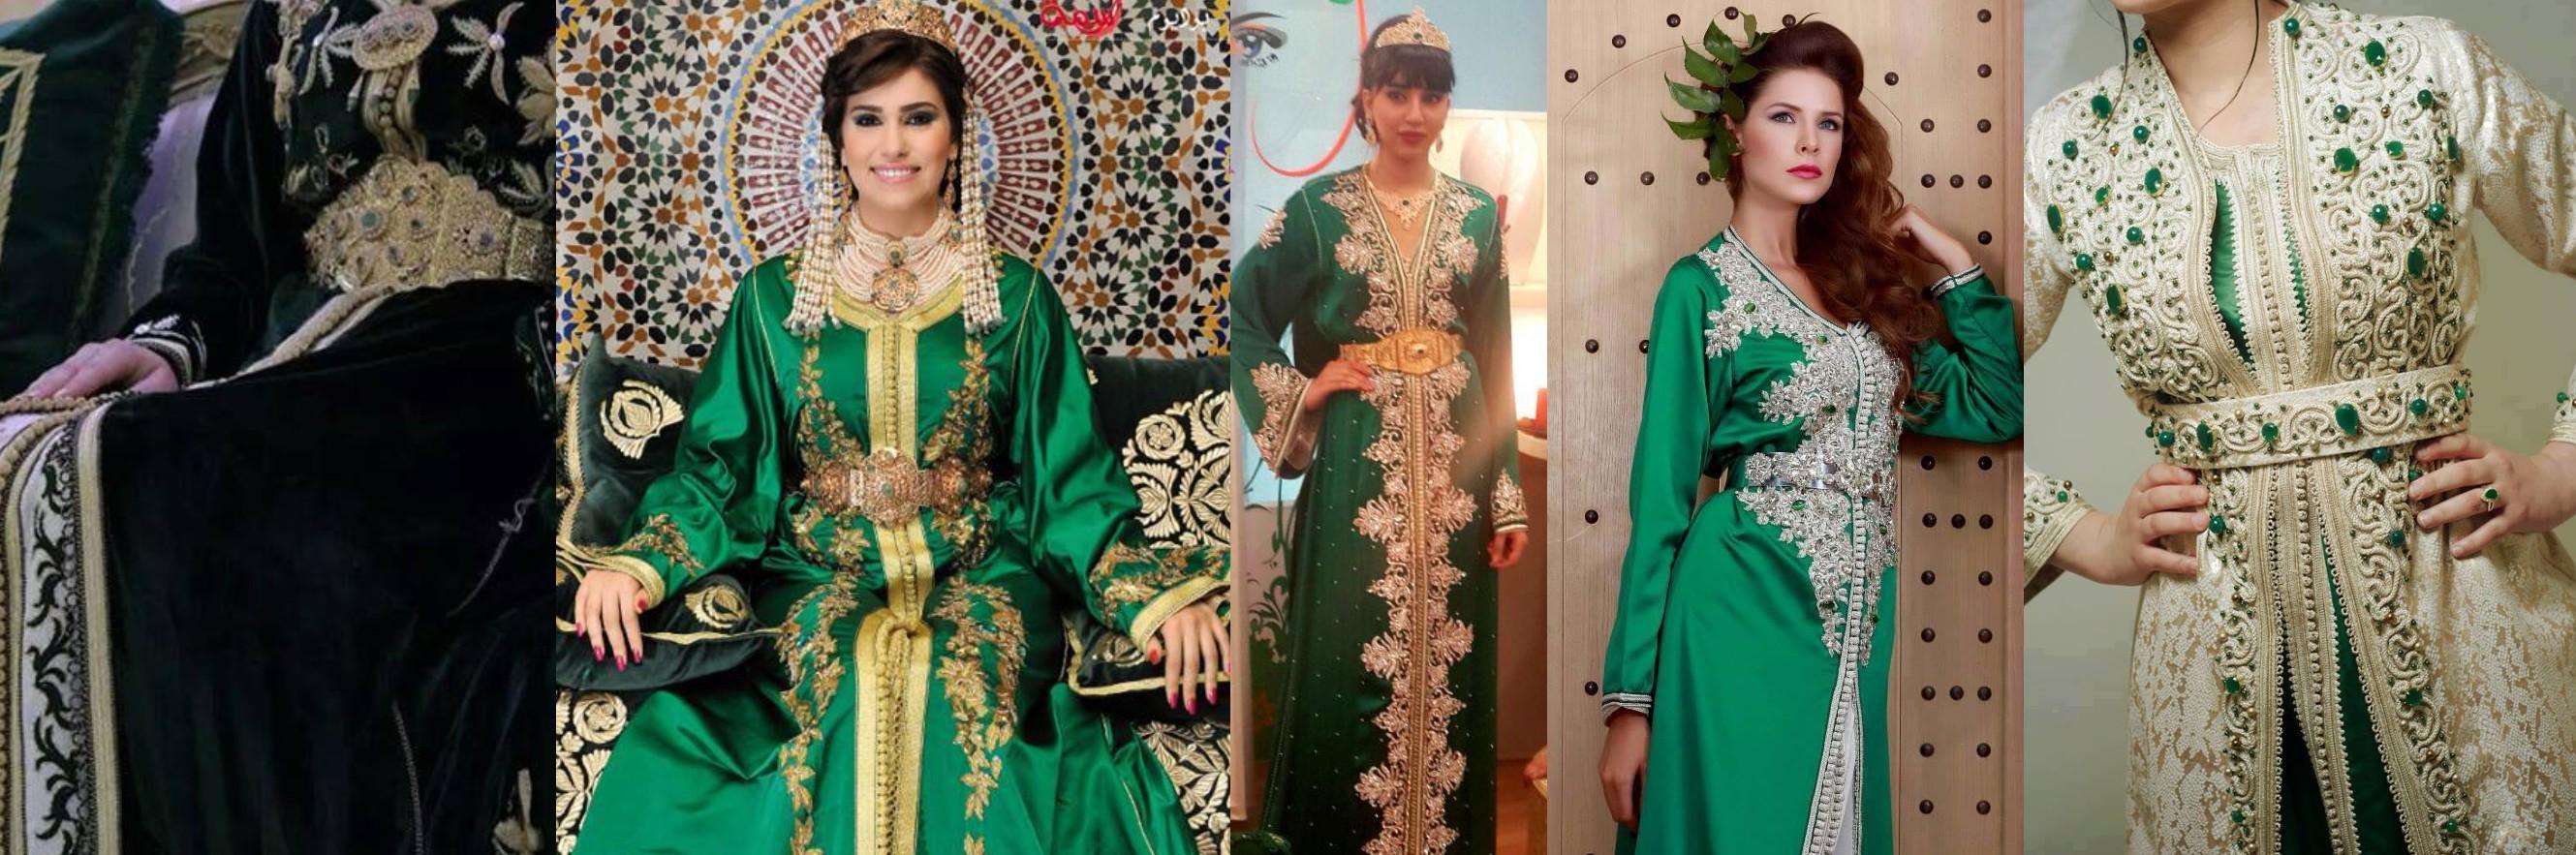 caftan marocain mode 2016 pour henna